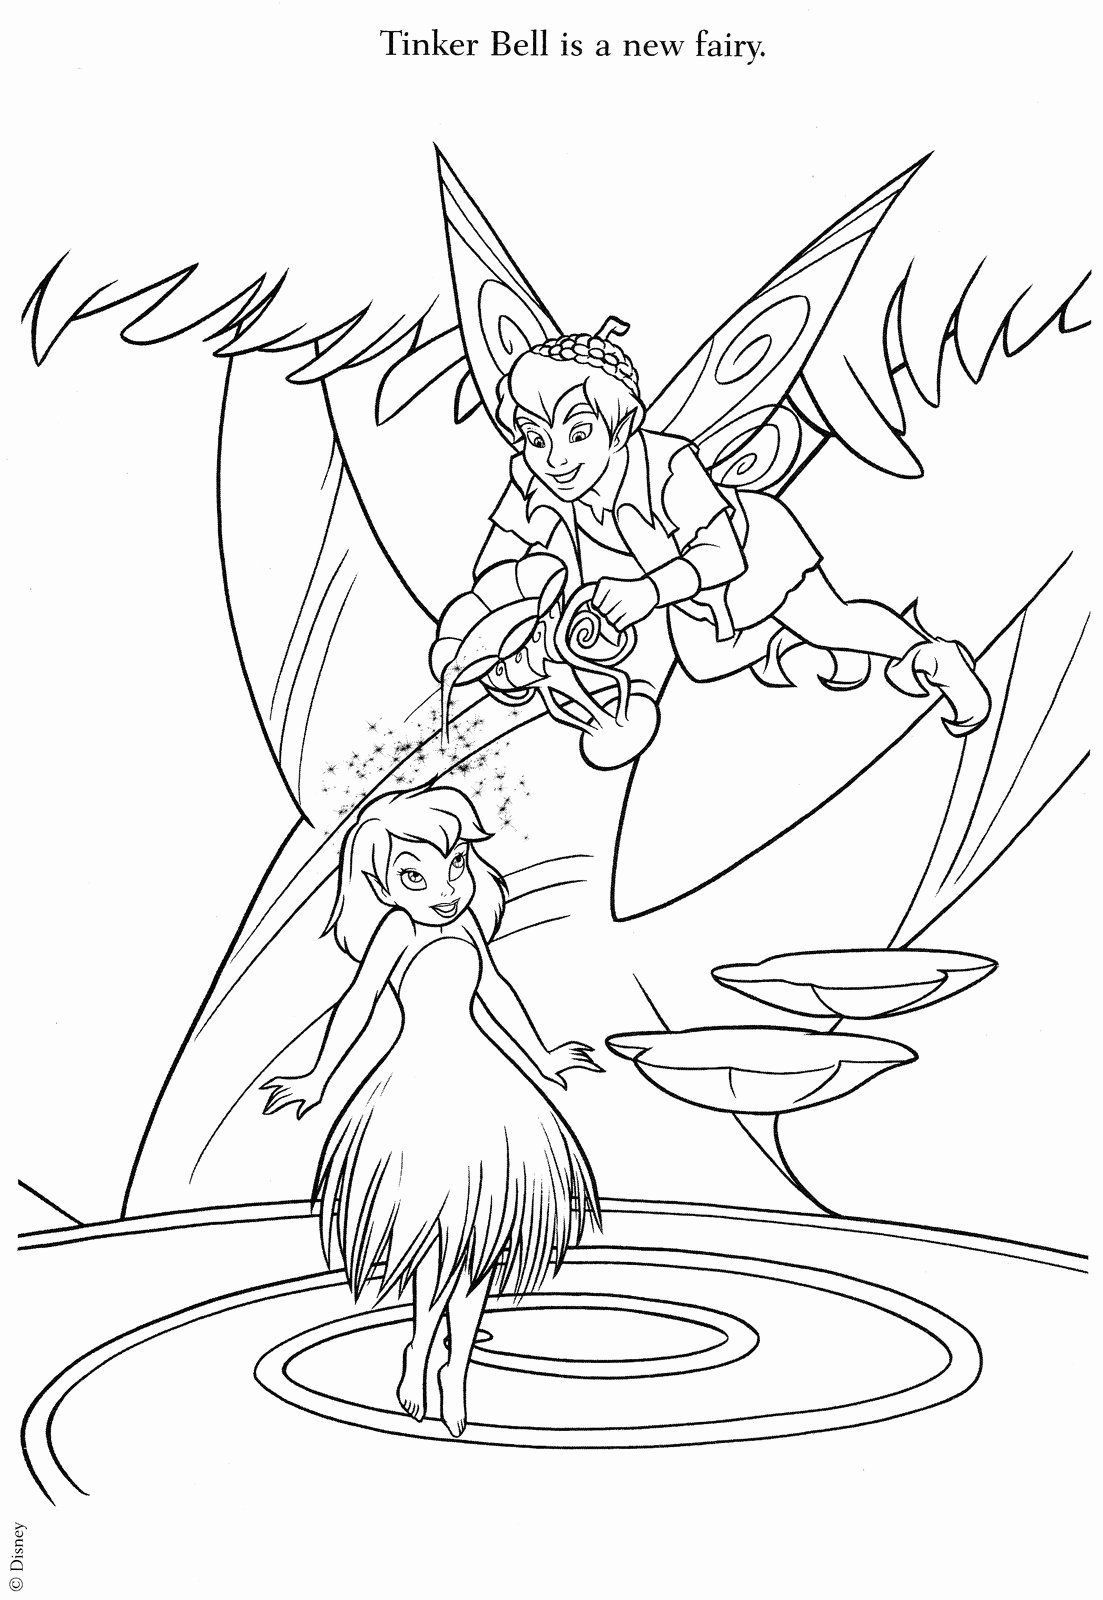 Disney Fairy Coloring Pages Luxury Desenhos Para Colorir Sininho Parte 4 Coloring Colorir De Fairy Coloring Pages Tinkerbell Coloring Pages Fairy Coloring [ 1600 x 1103 Pixel ]